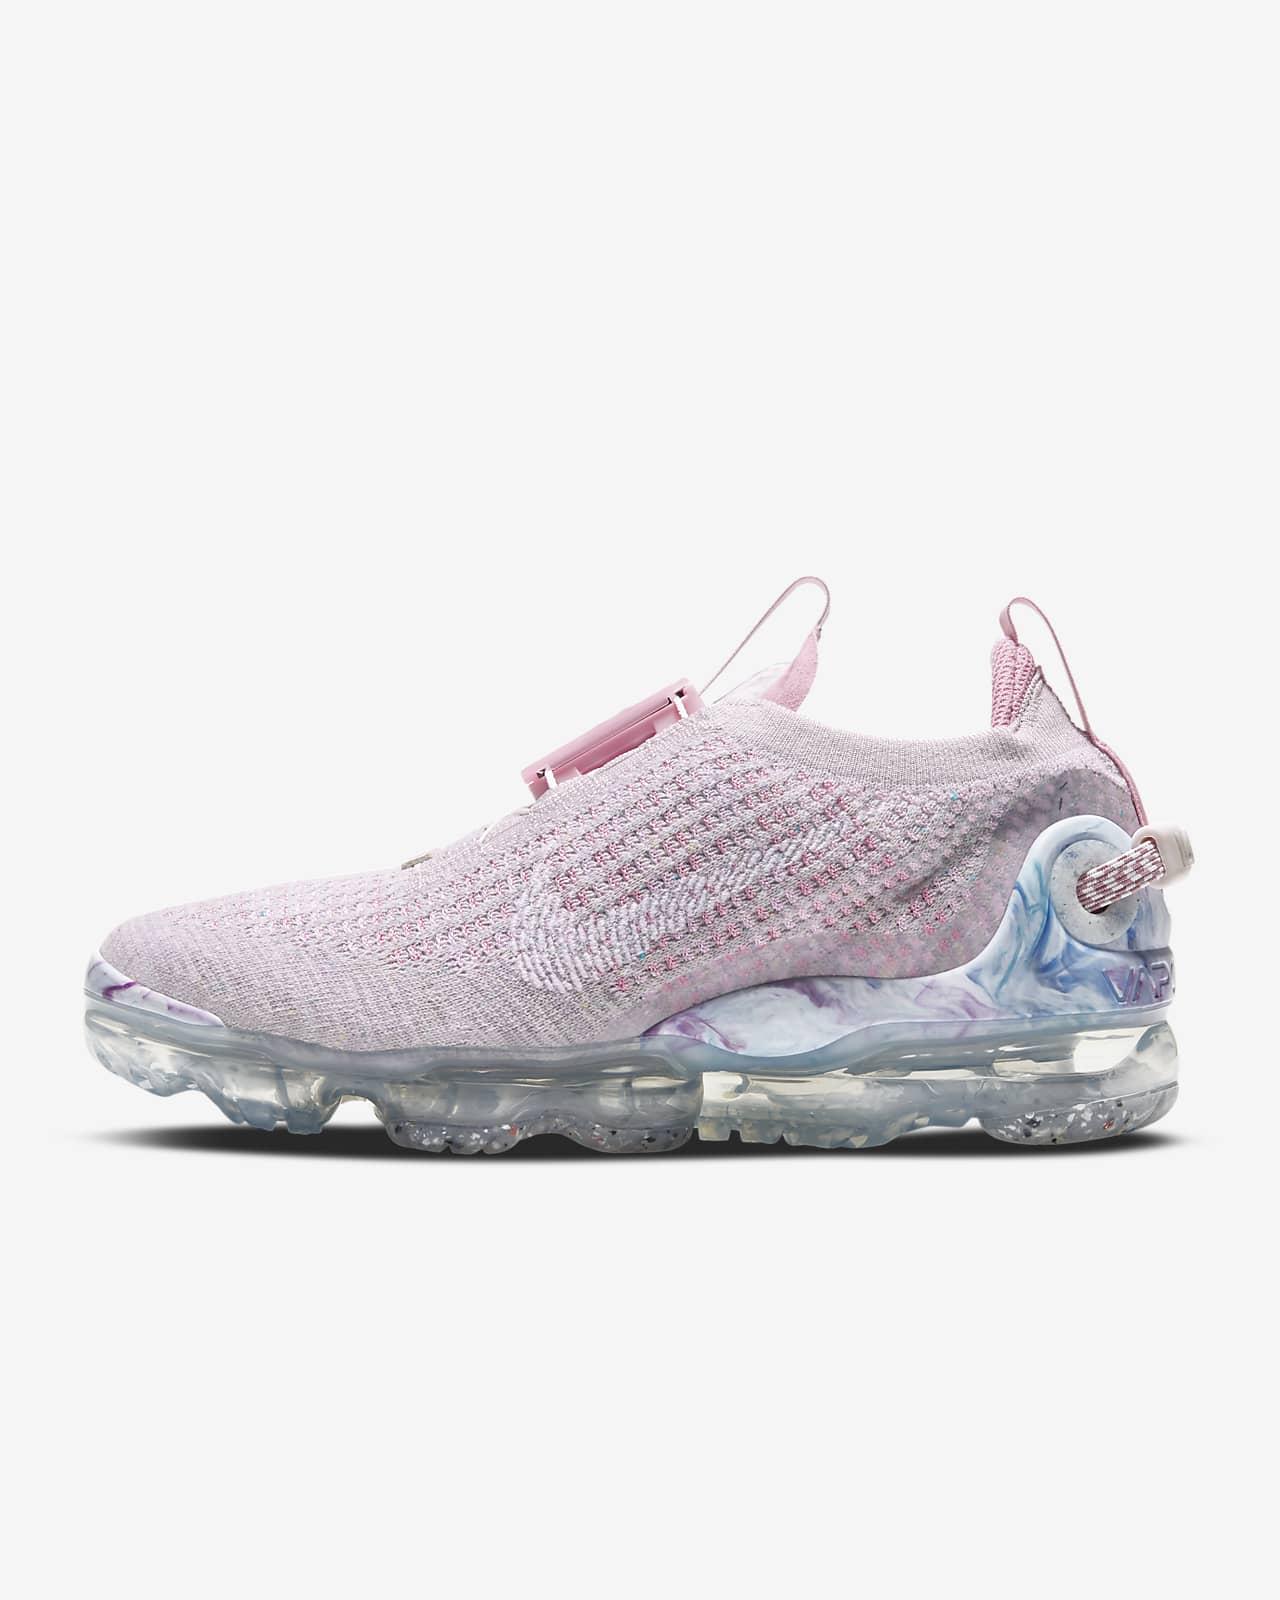 nike chaussure femmes 2020